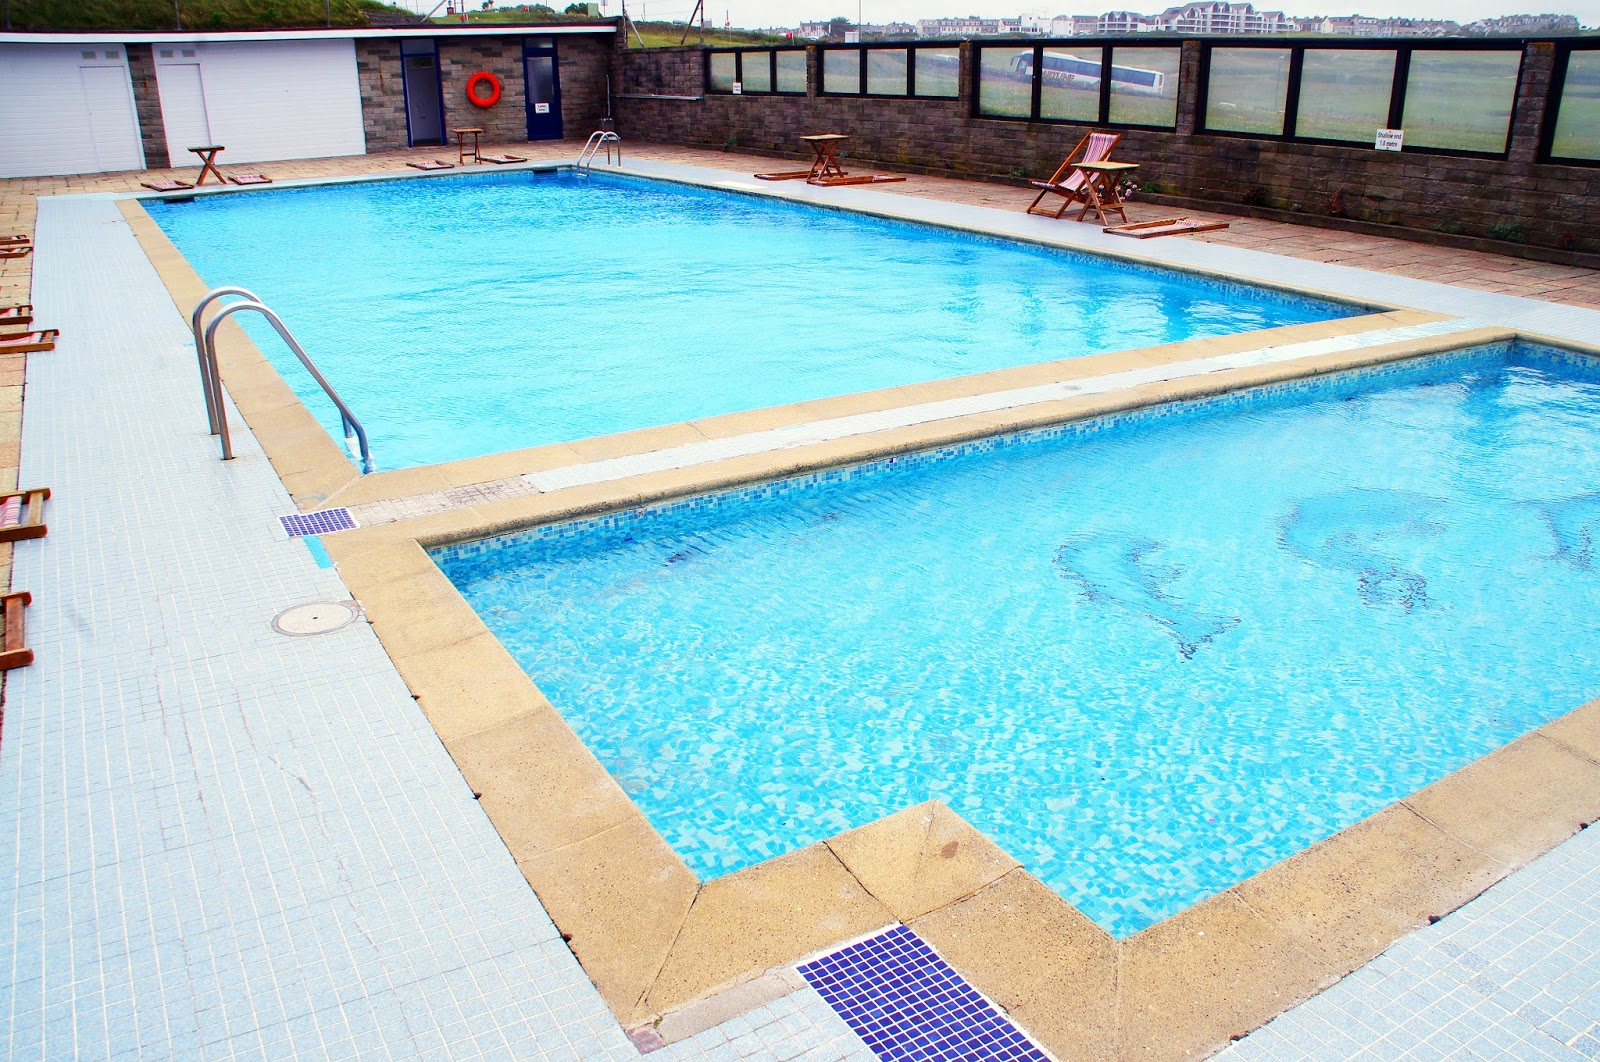 Headland Hotel Newquay Cornwall Pool